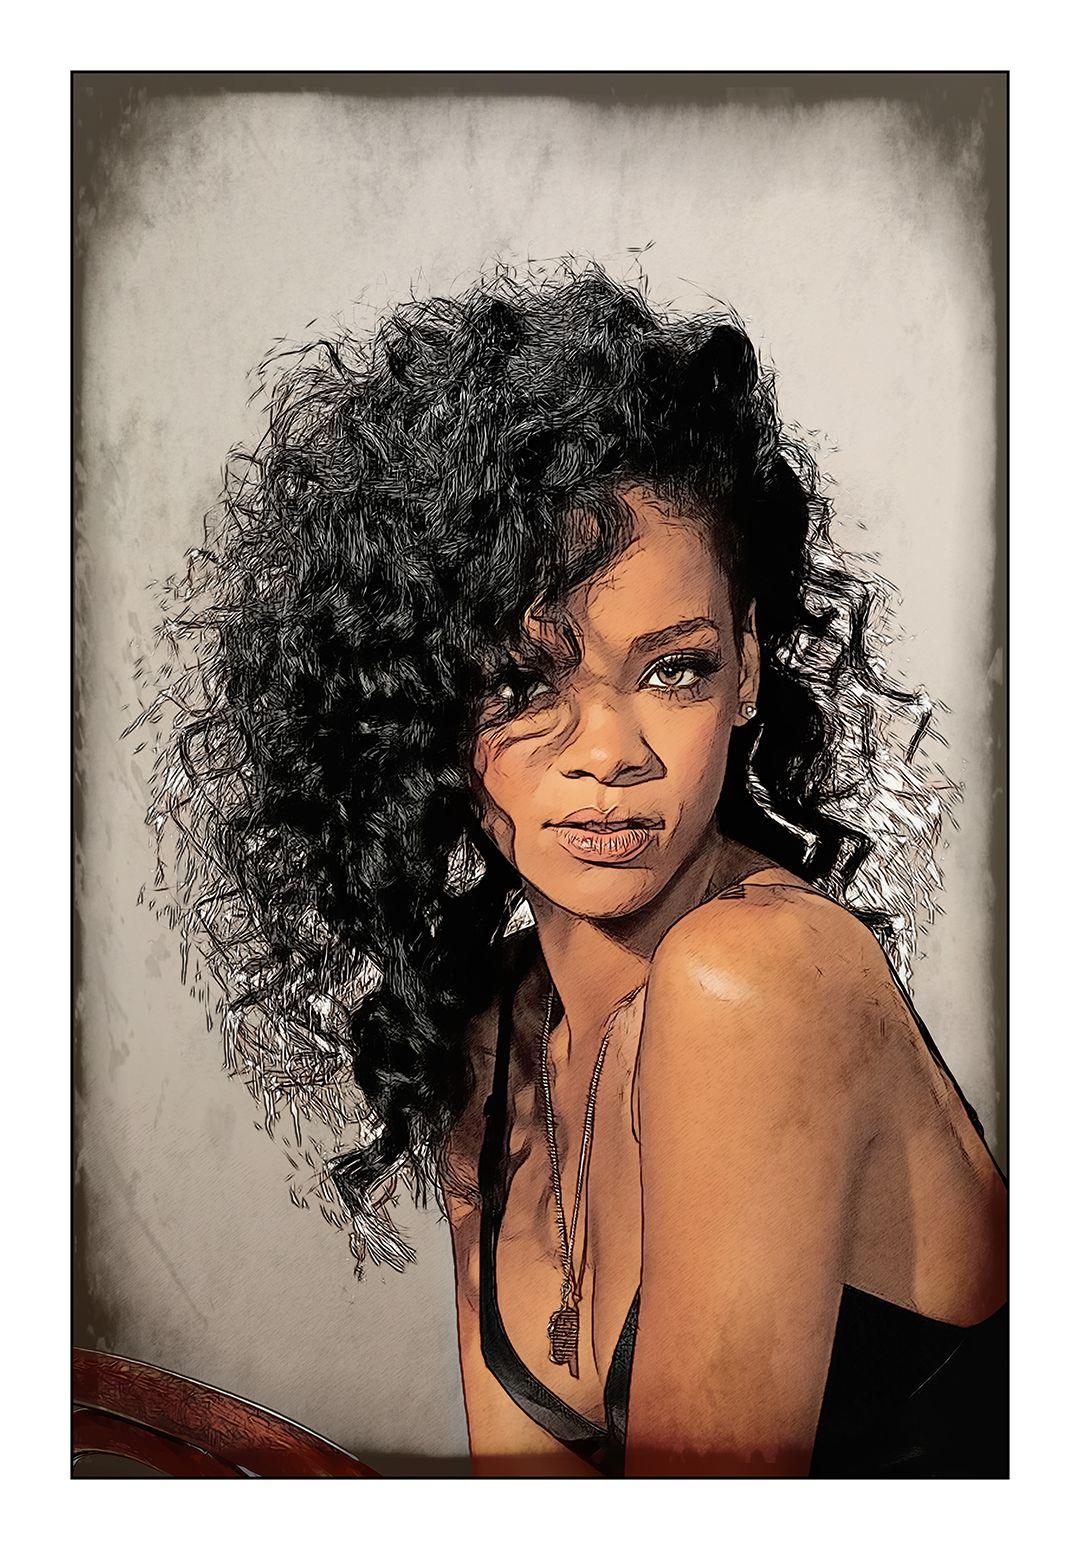 Rihanna: Art That Makes Your Brain Happy!    An Art Work of Rihanna by Dan Newburn of the Morgan-Newburn Foundation for the Arts, Las Vegas, Nevada